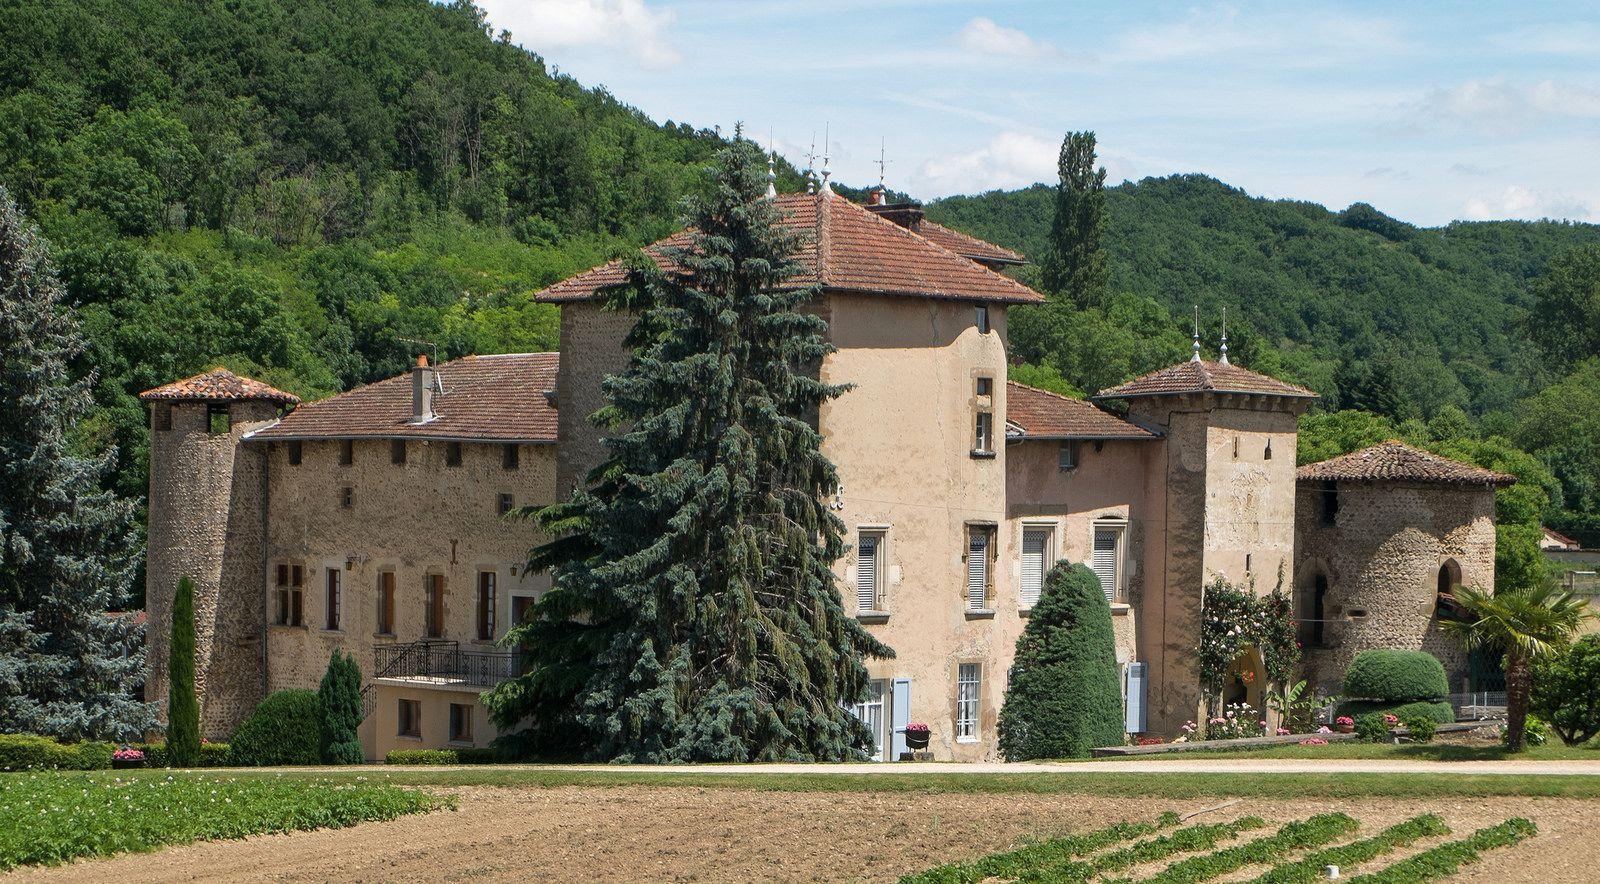 Chateau De La Saone Lens Lestang Drome France France Rhone Rhones Alpes